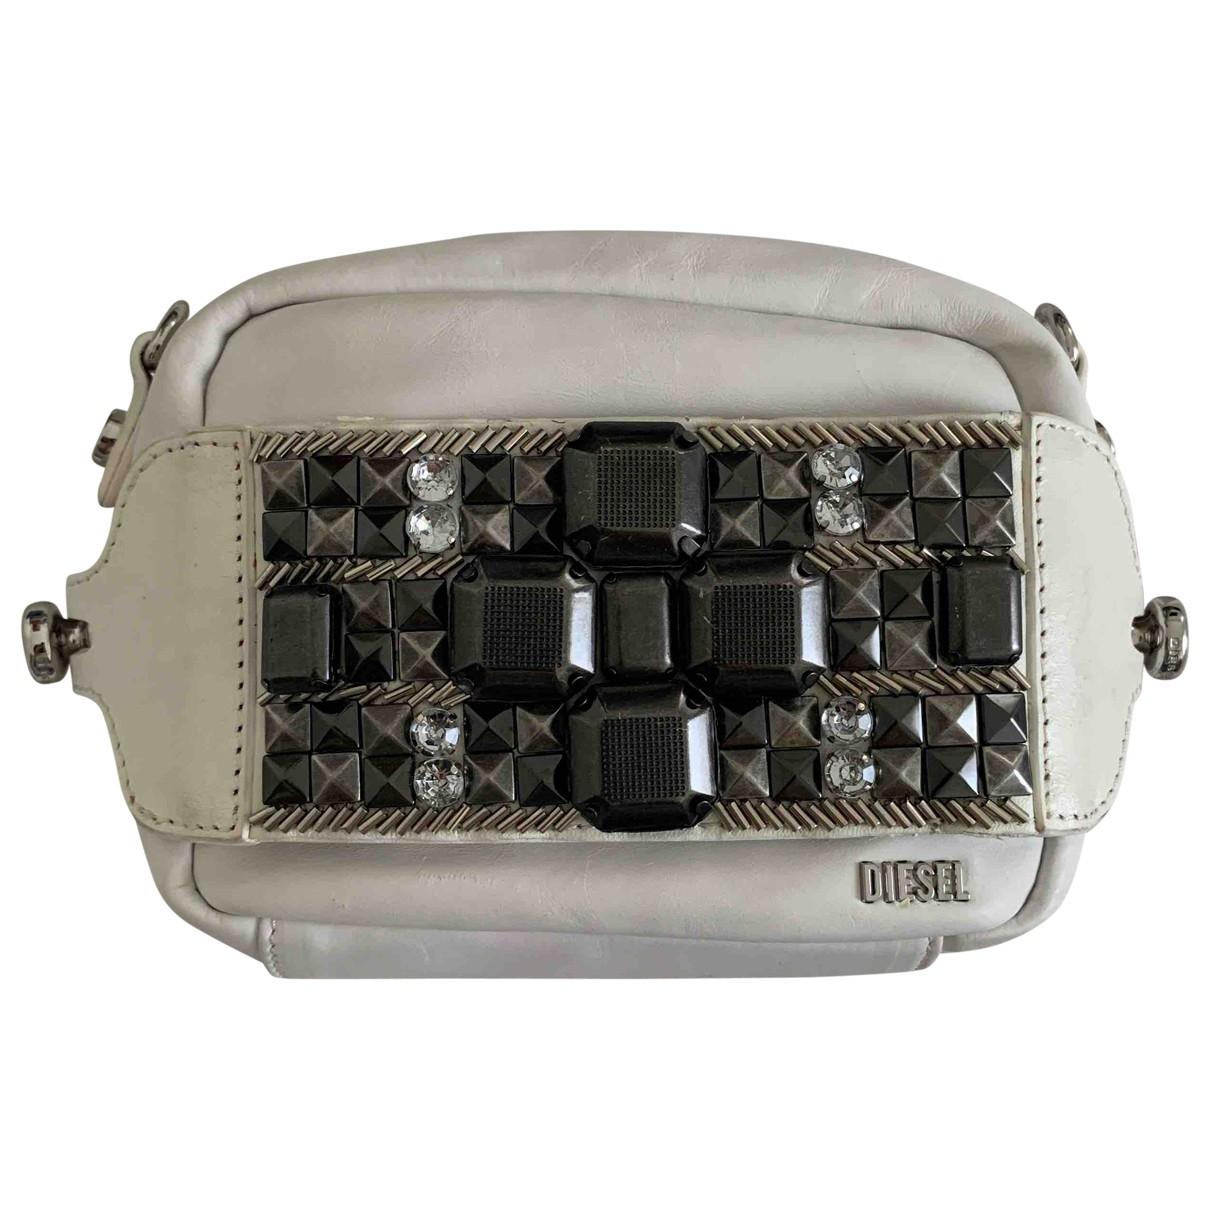 Diesel \N White Leather Clutch bag for Women \N